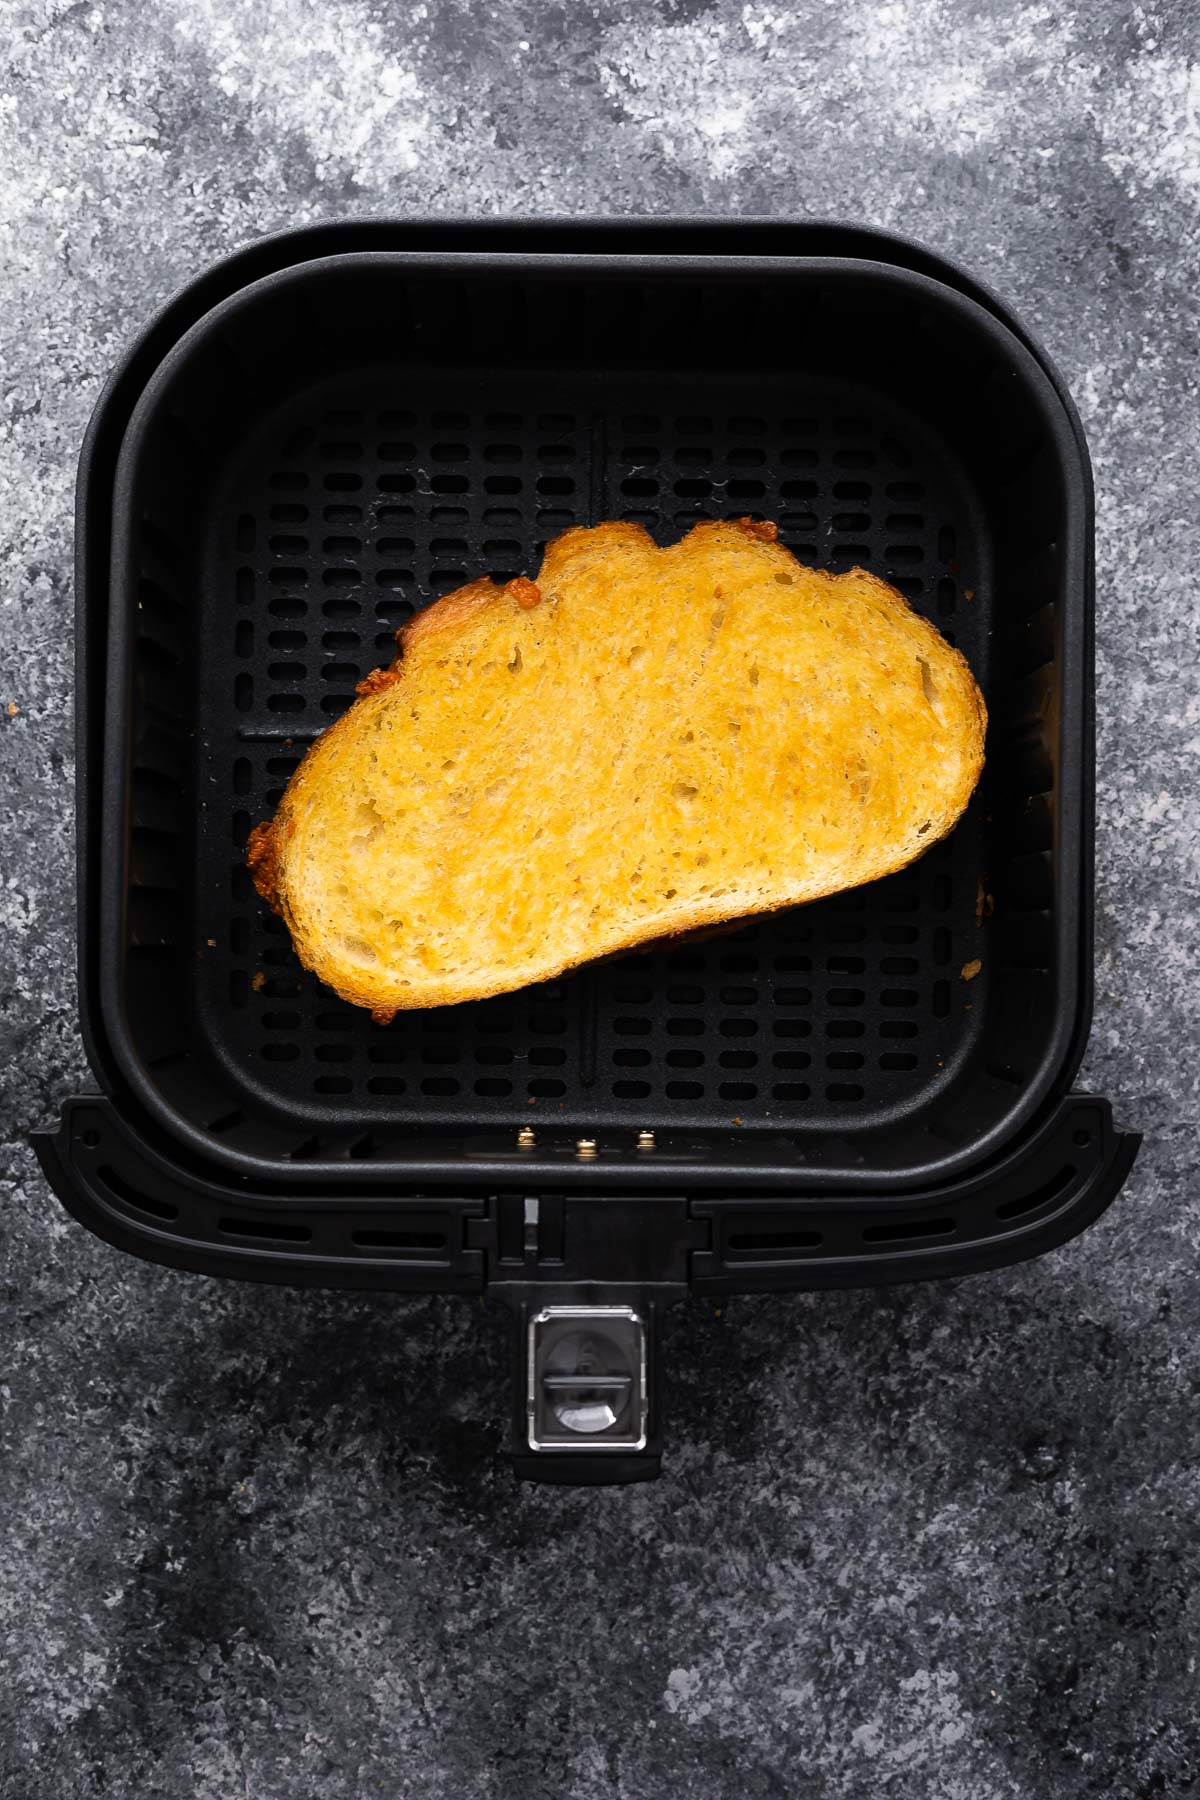 hava fritöz sepetinde oturan pişmiş ızgara peynir